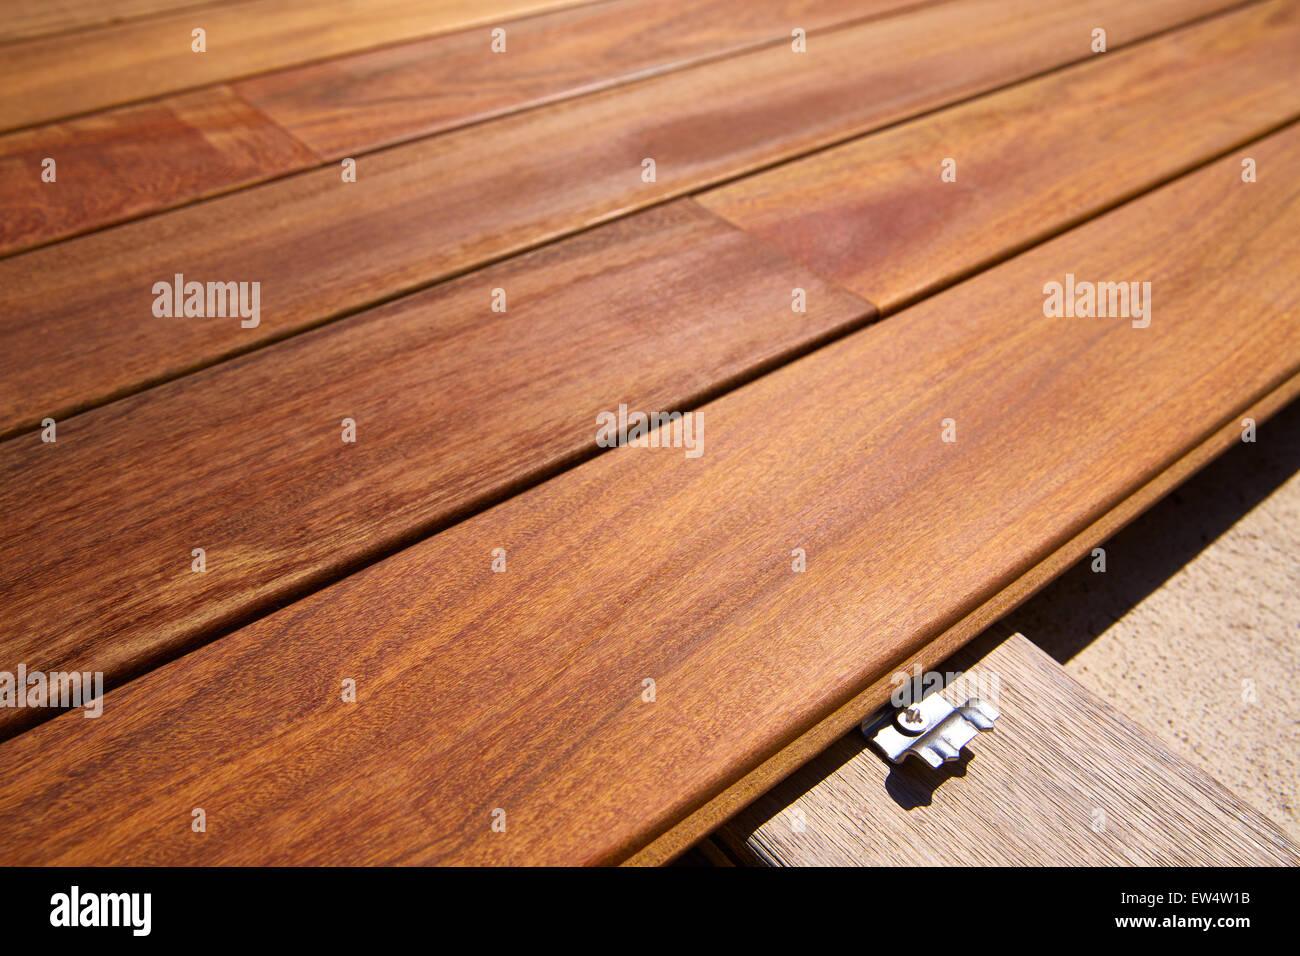 Teakholz Terrassendielen ipe teak decking deck wood stockfotos ipe teak decking deck wood